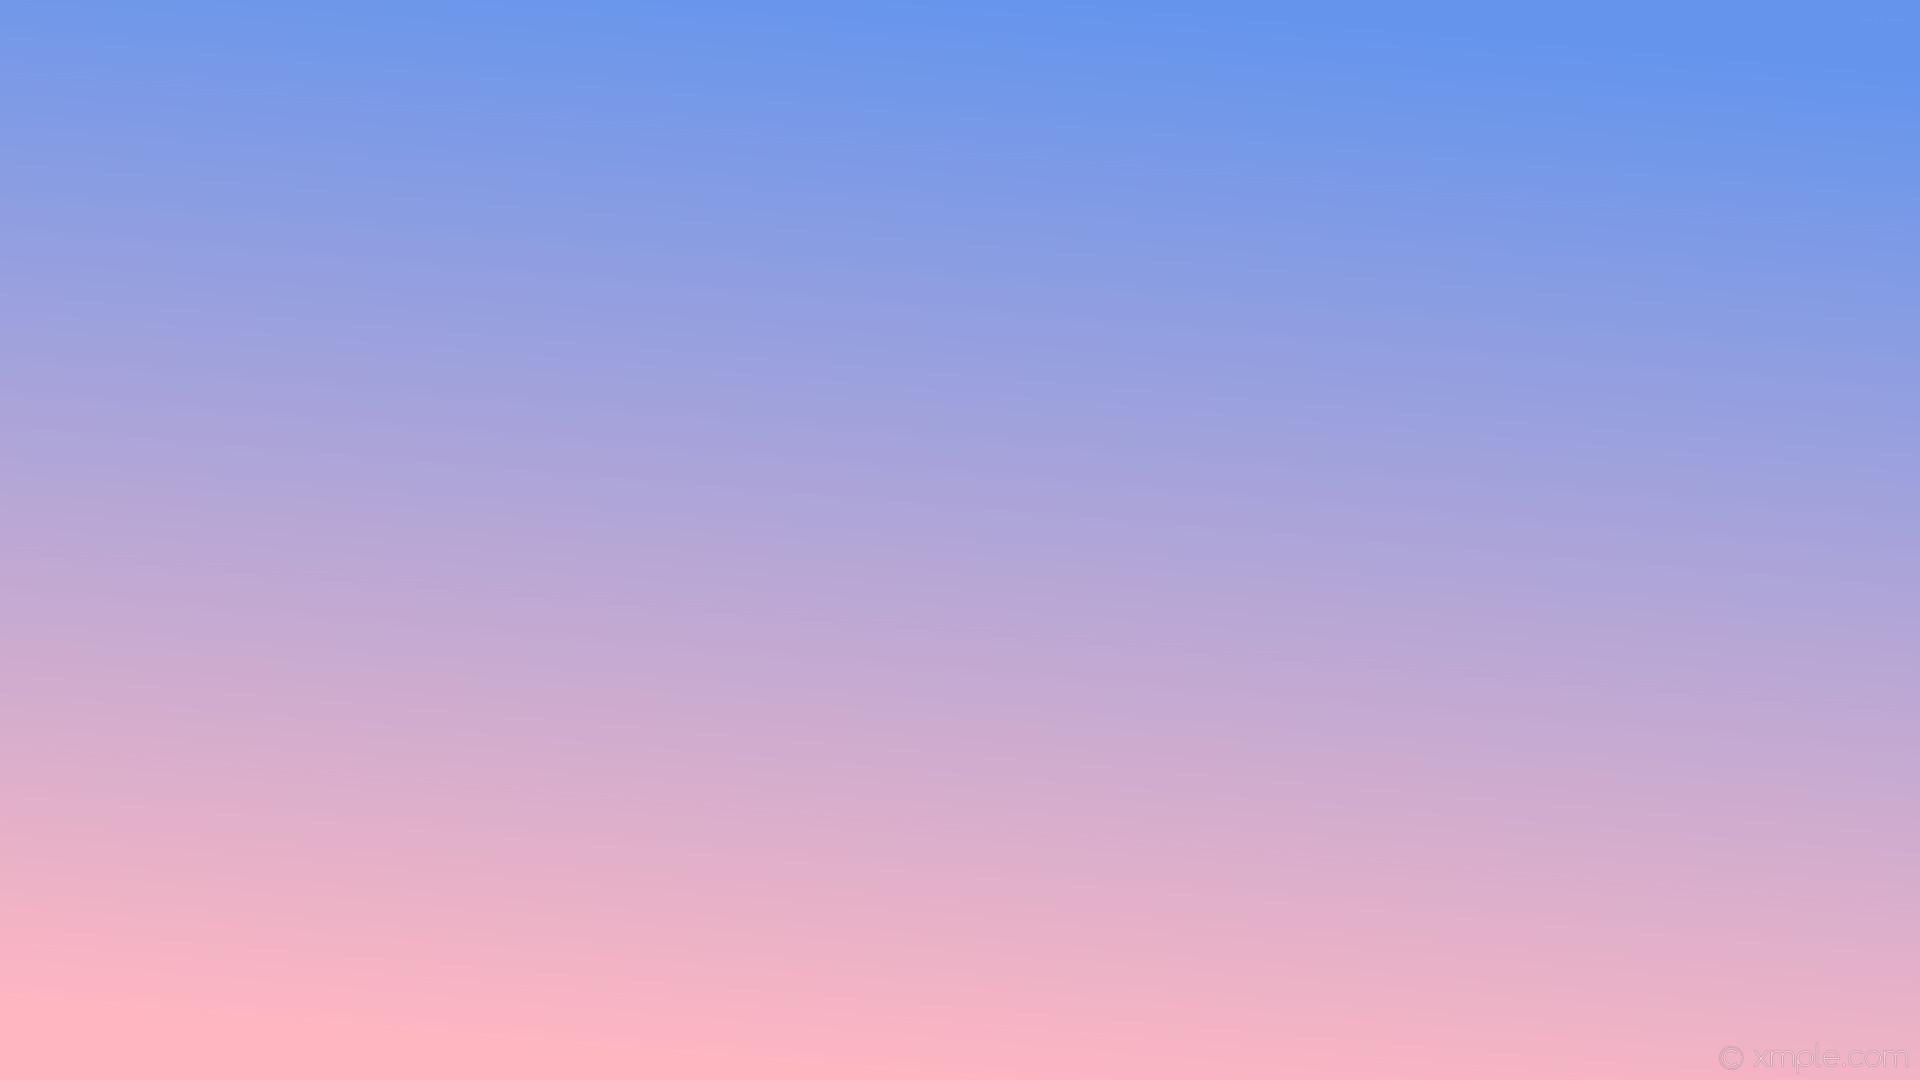 wallpaper blue pink gradient linear light pink cornflower blue #ffb6c1  #6495ed 255°